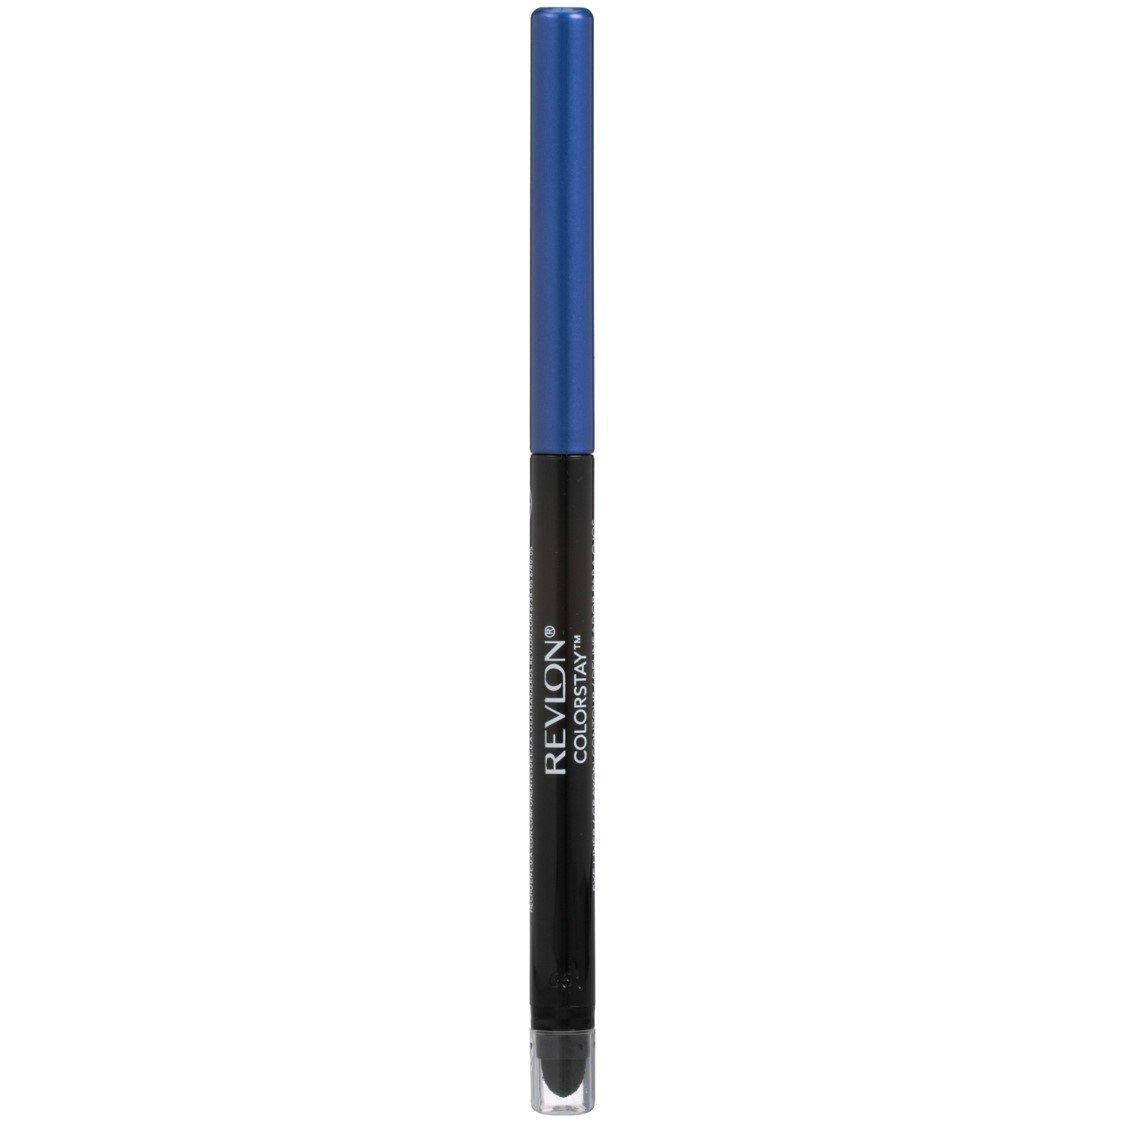 Revlon ColorStay Eyeliner Pencil, Sapphire